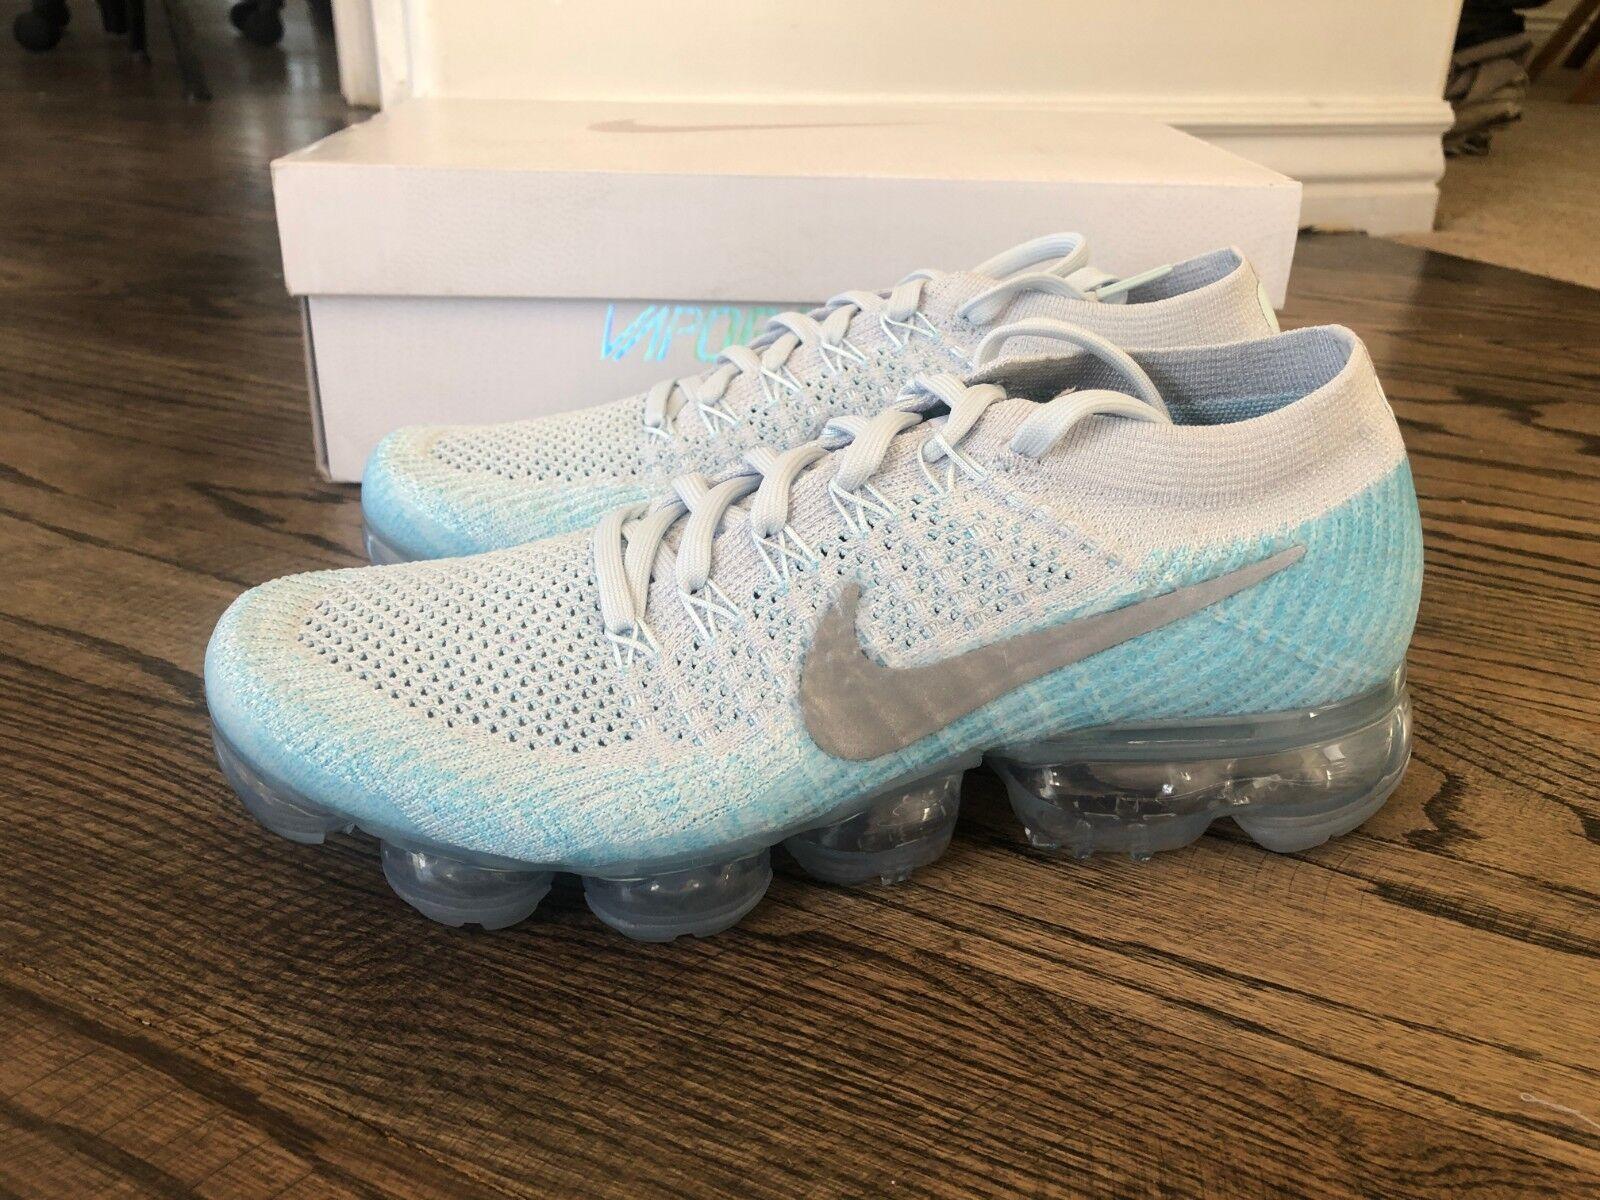 sneakers for cheap ec2f6 d1232 Nike air vapormax donne flyknit di puro platino platino platino silver  849557 014 sz 8,